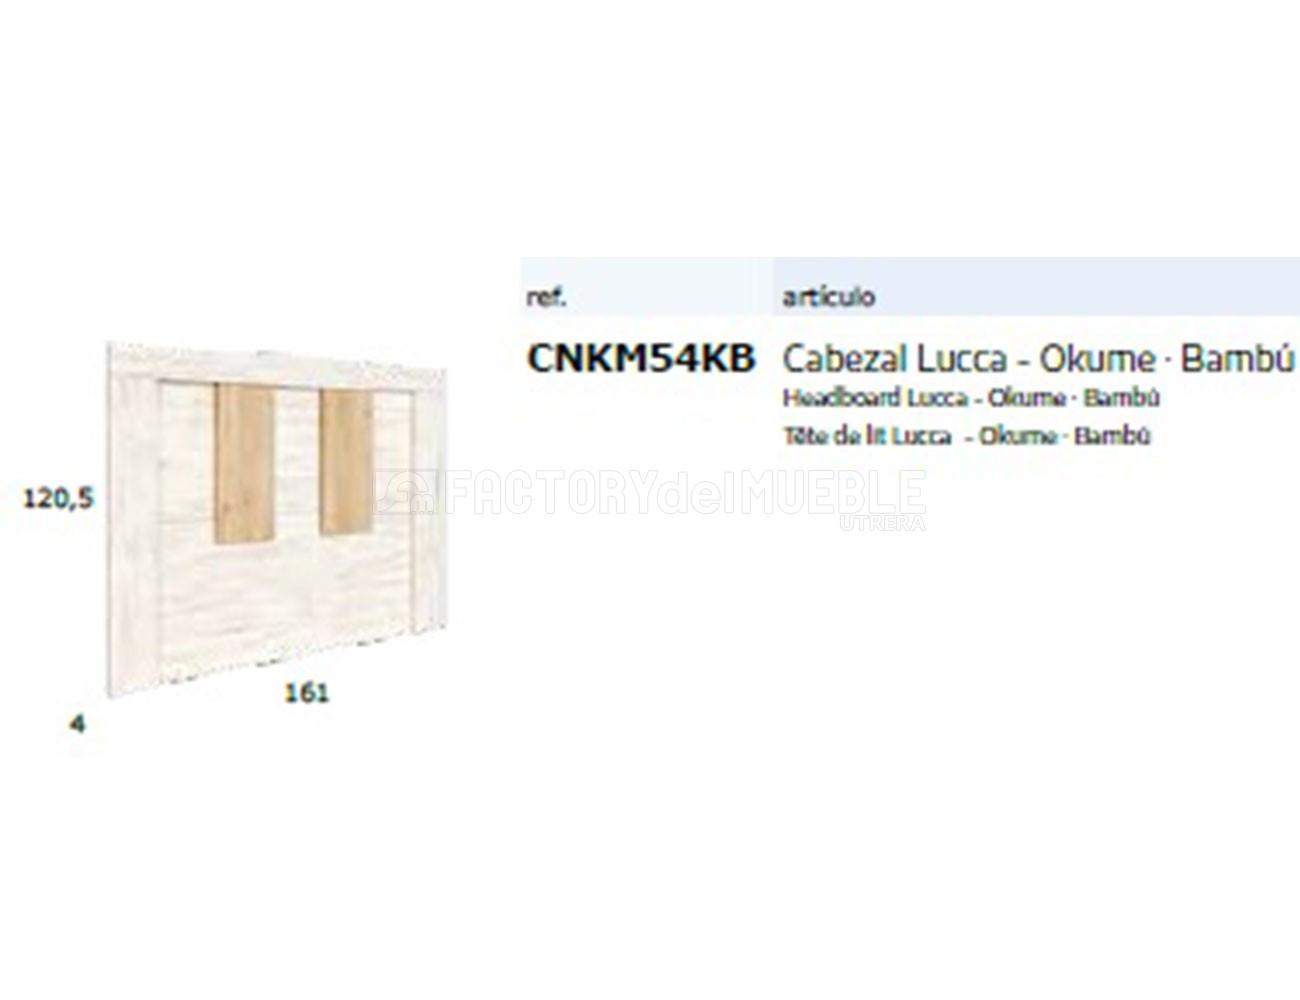 Cnkm54kb cabezal lucca